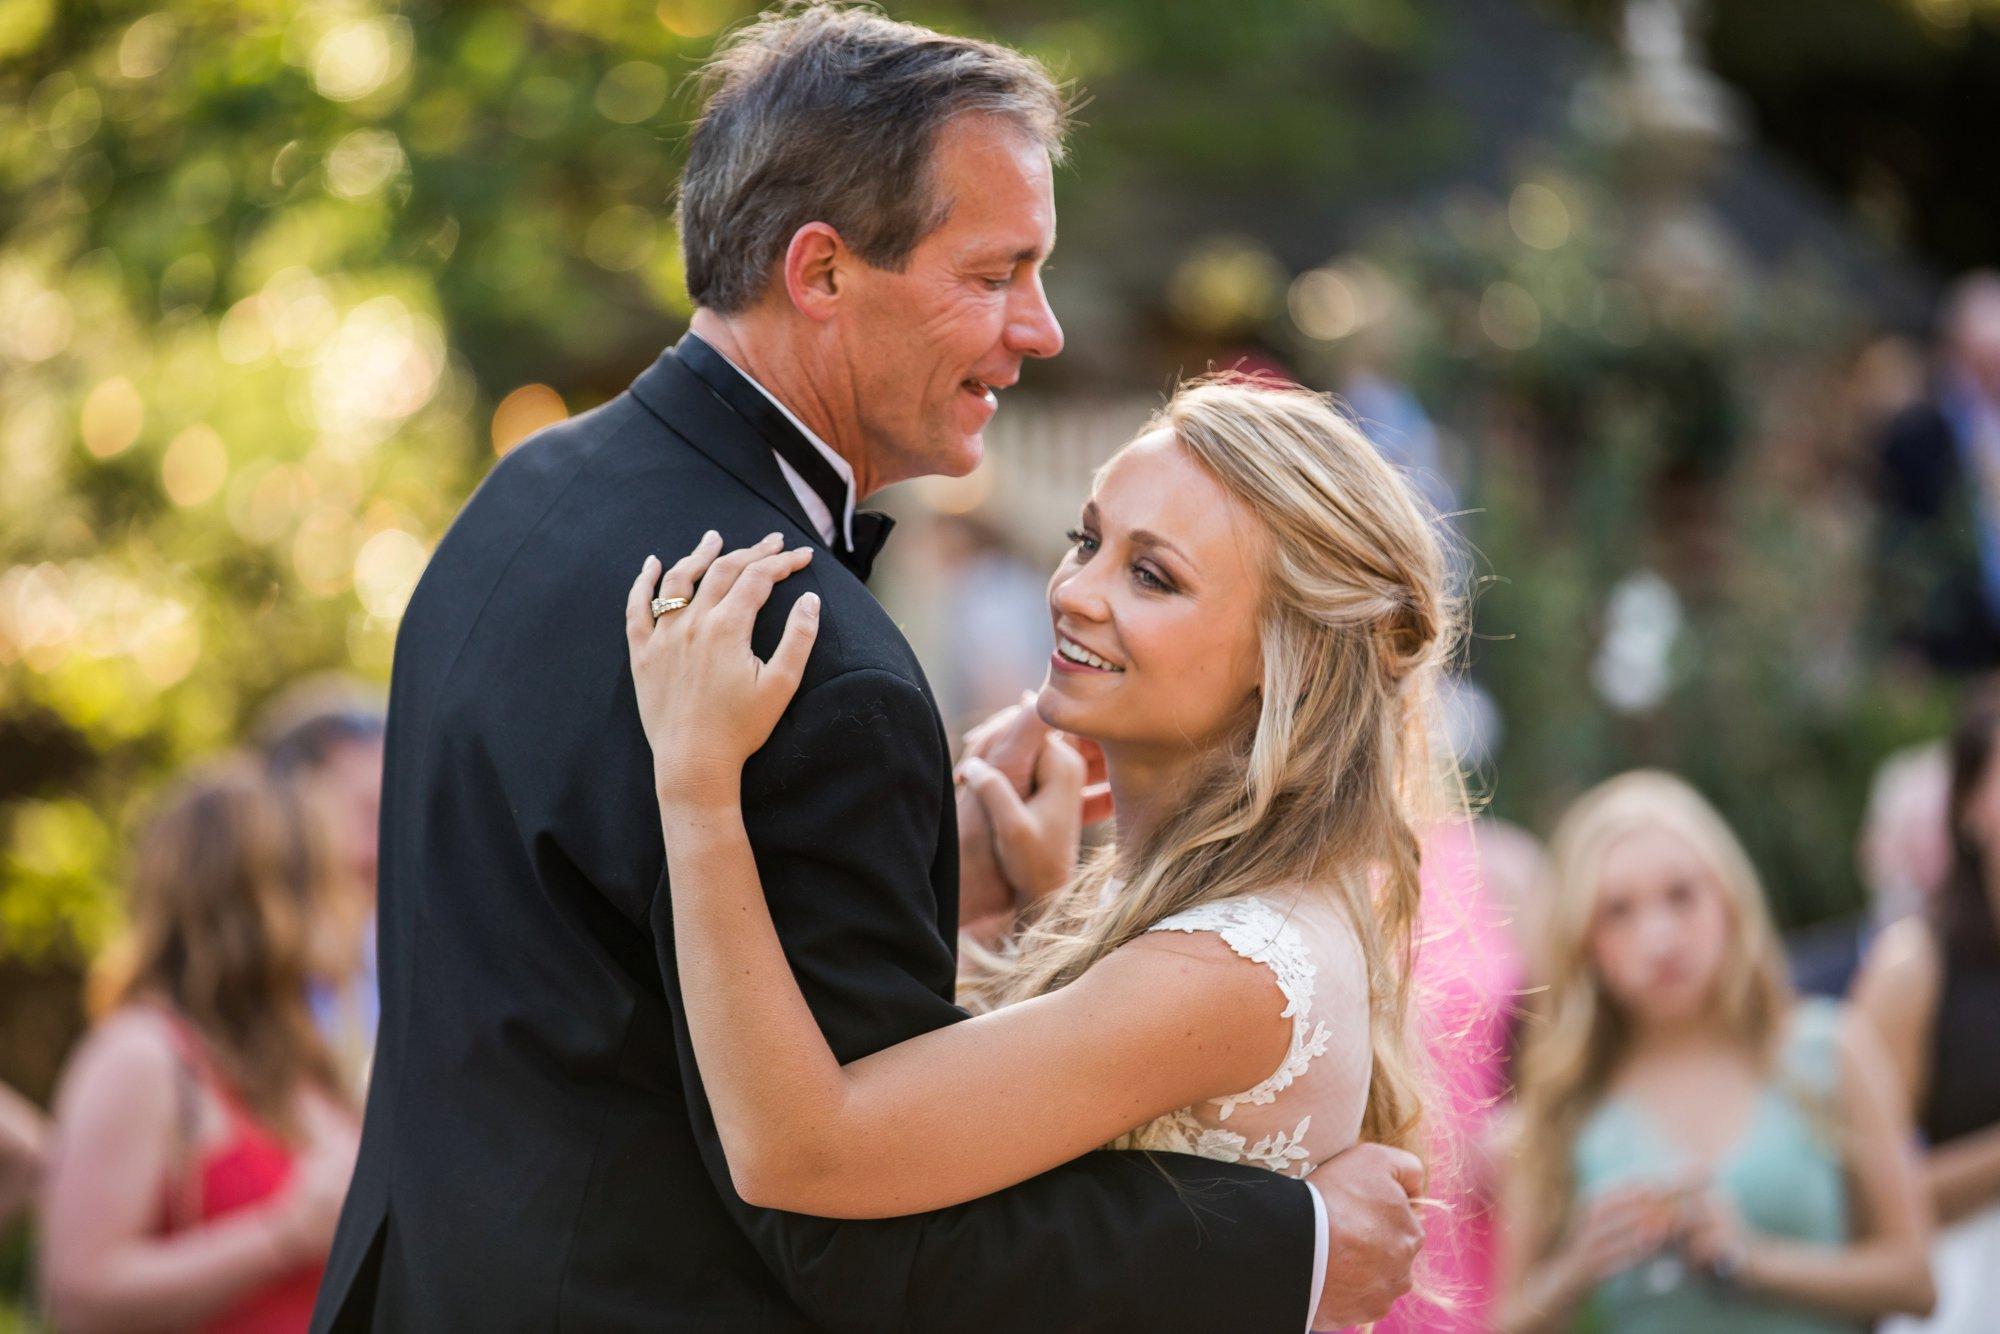 wedding-photography-88-love-stories_0042.jpg